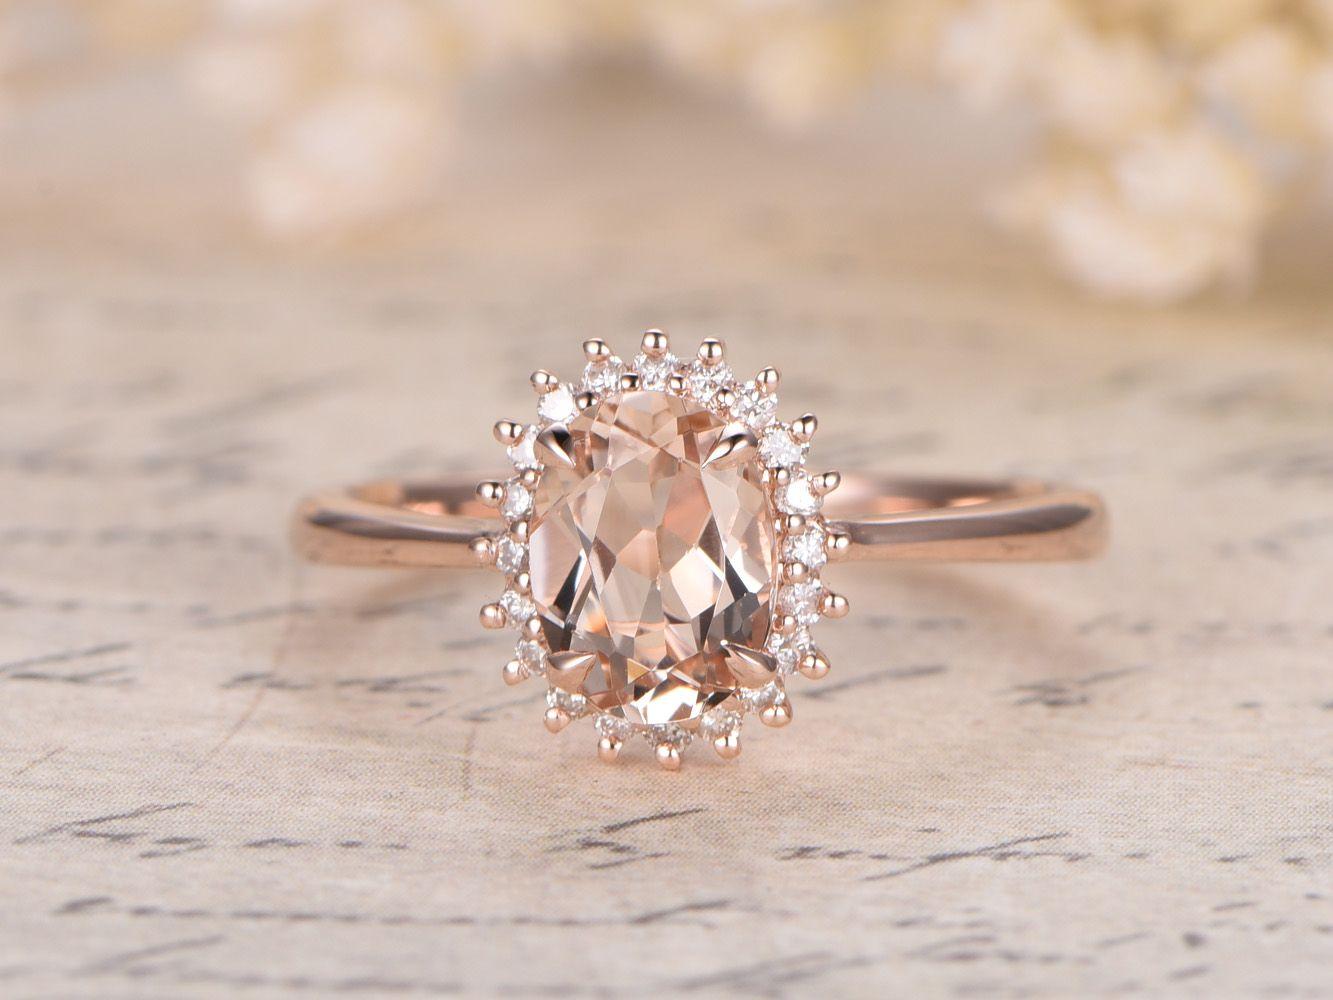 Princess Diana Ring,6x8mm Oval VS Pink Ring,14K